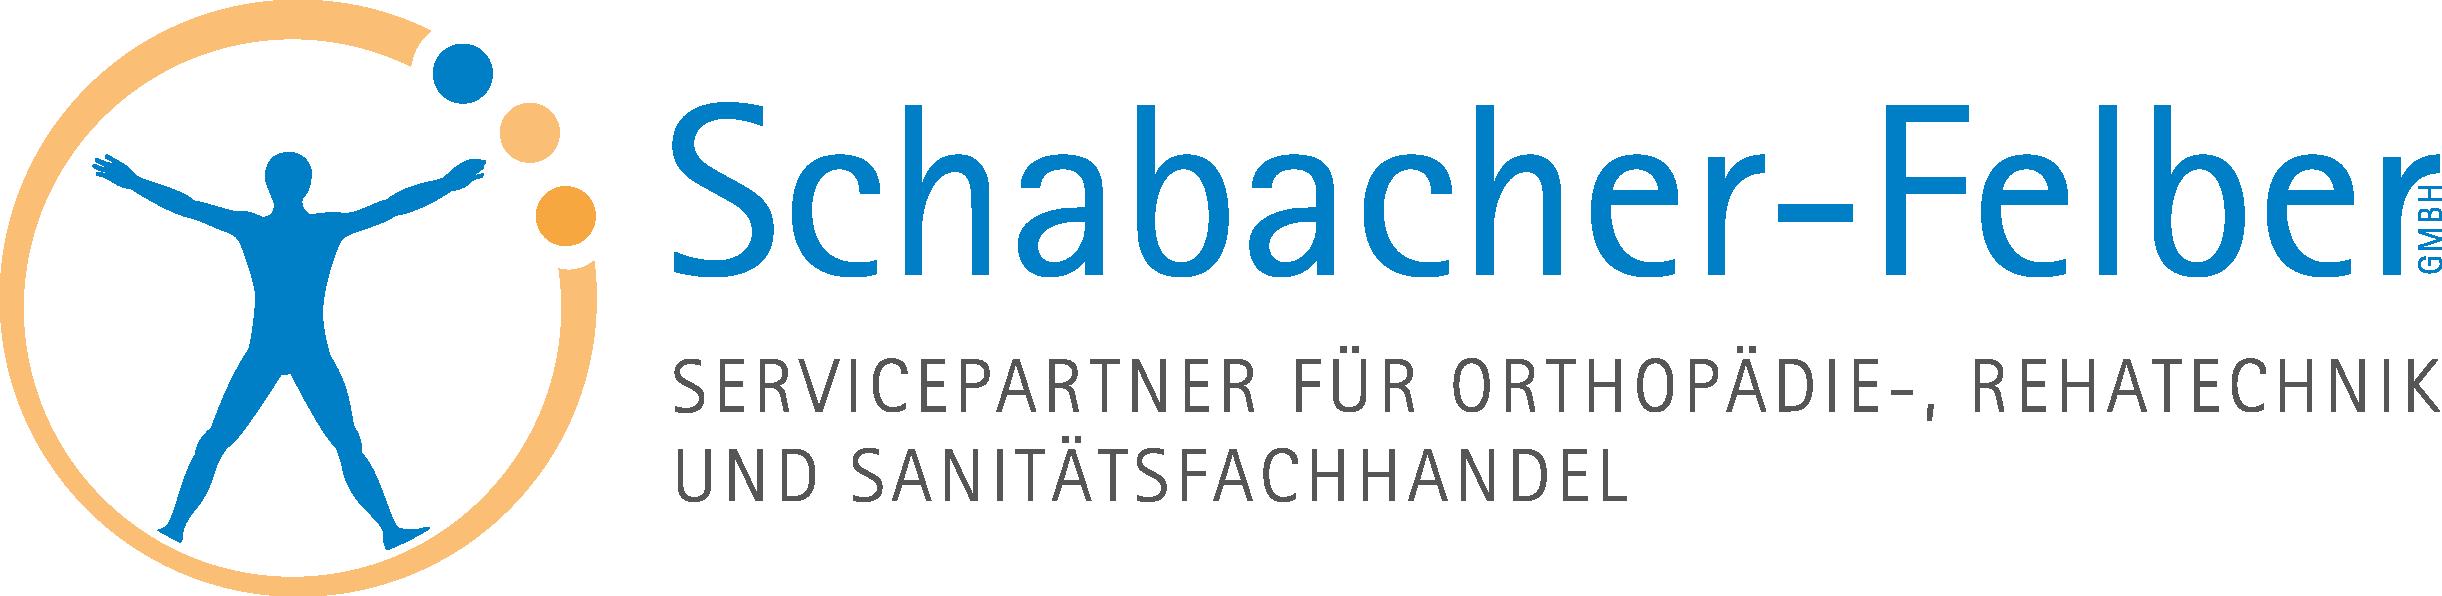 Schabacher-Felber